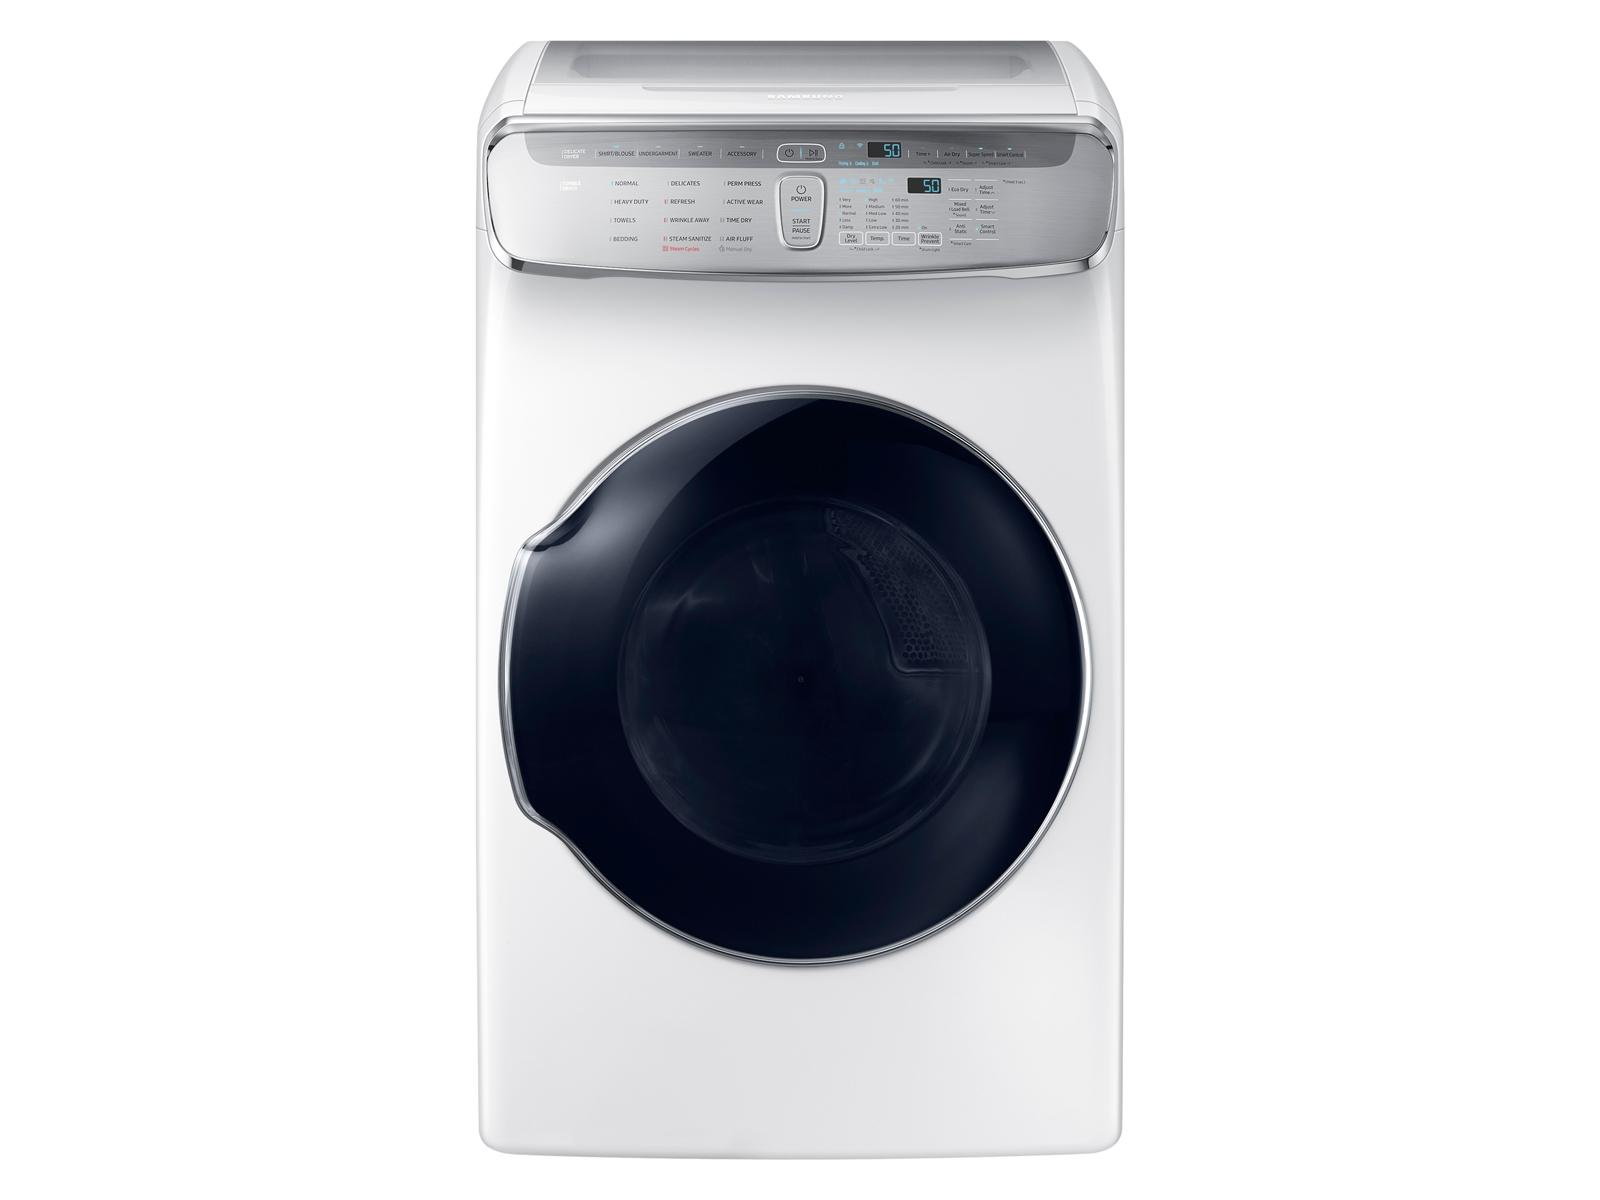 Samsung 7.5 cu. ft. FlexDry Electric Dryer in White